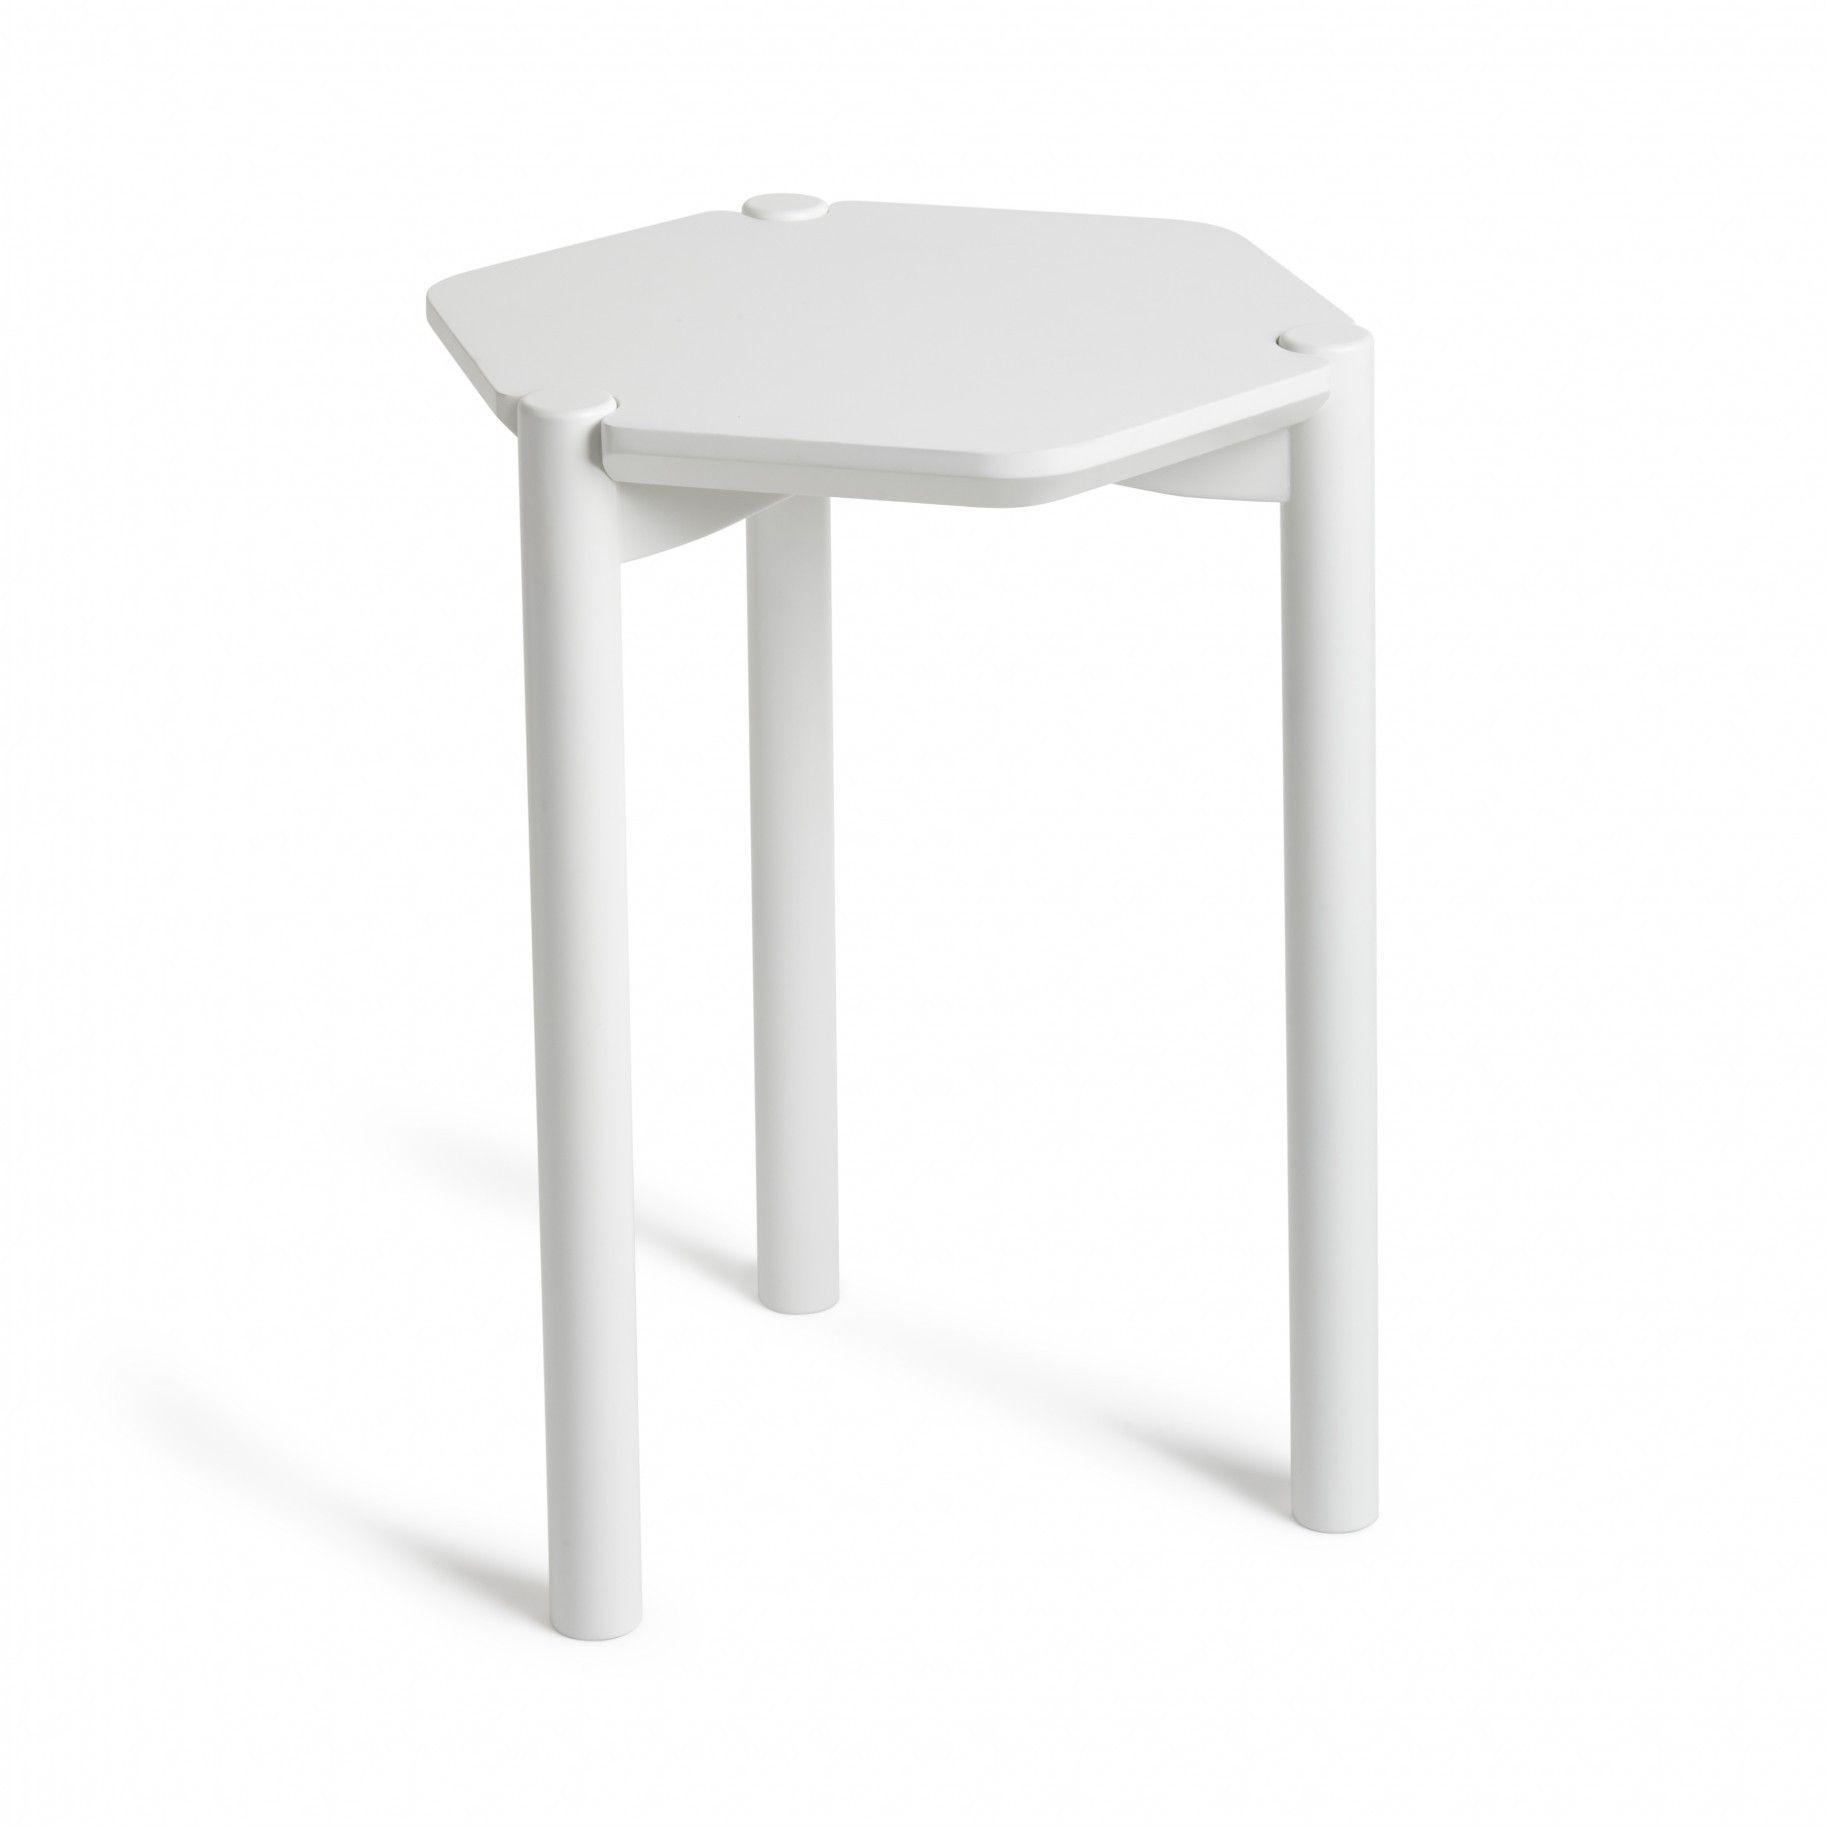 Hexa Side Table White Side Tables Side Table Modern